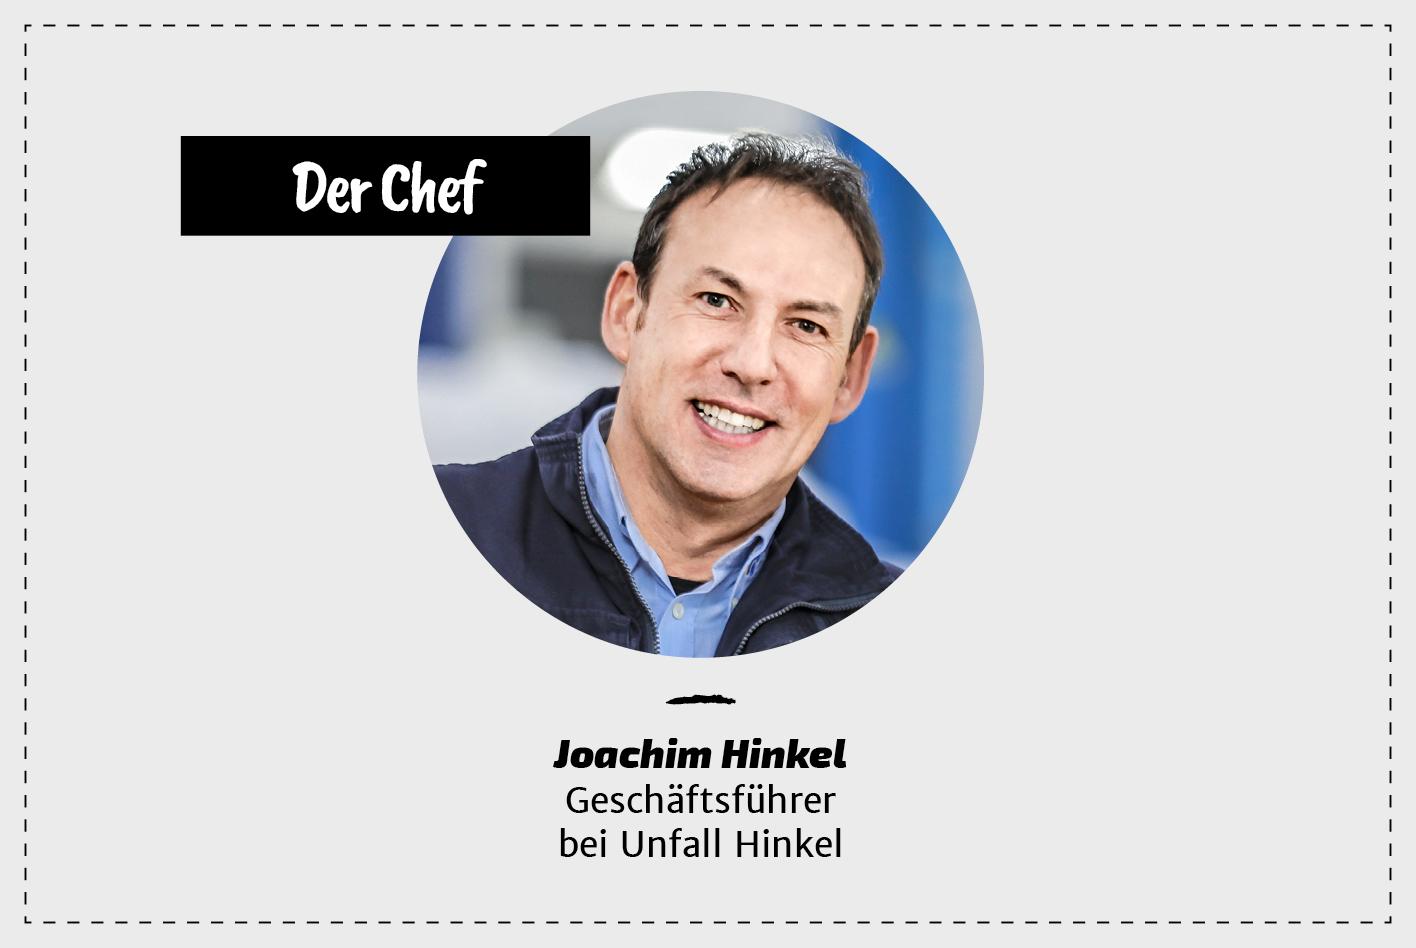 Chef Unfall Hinkel